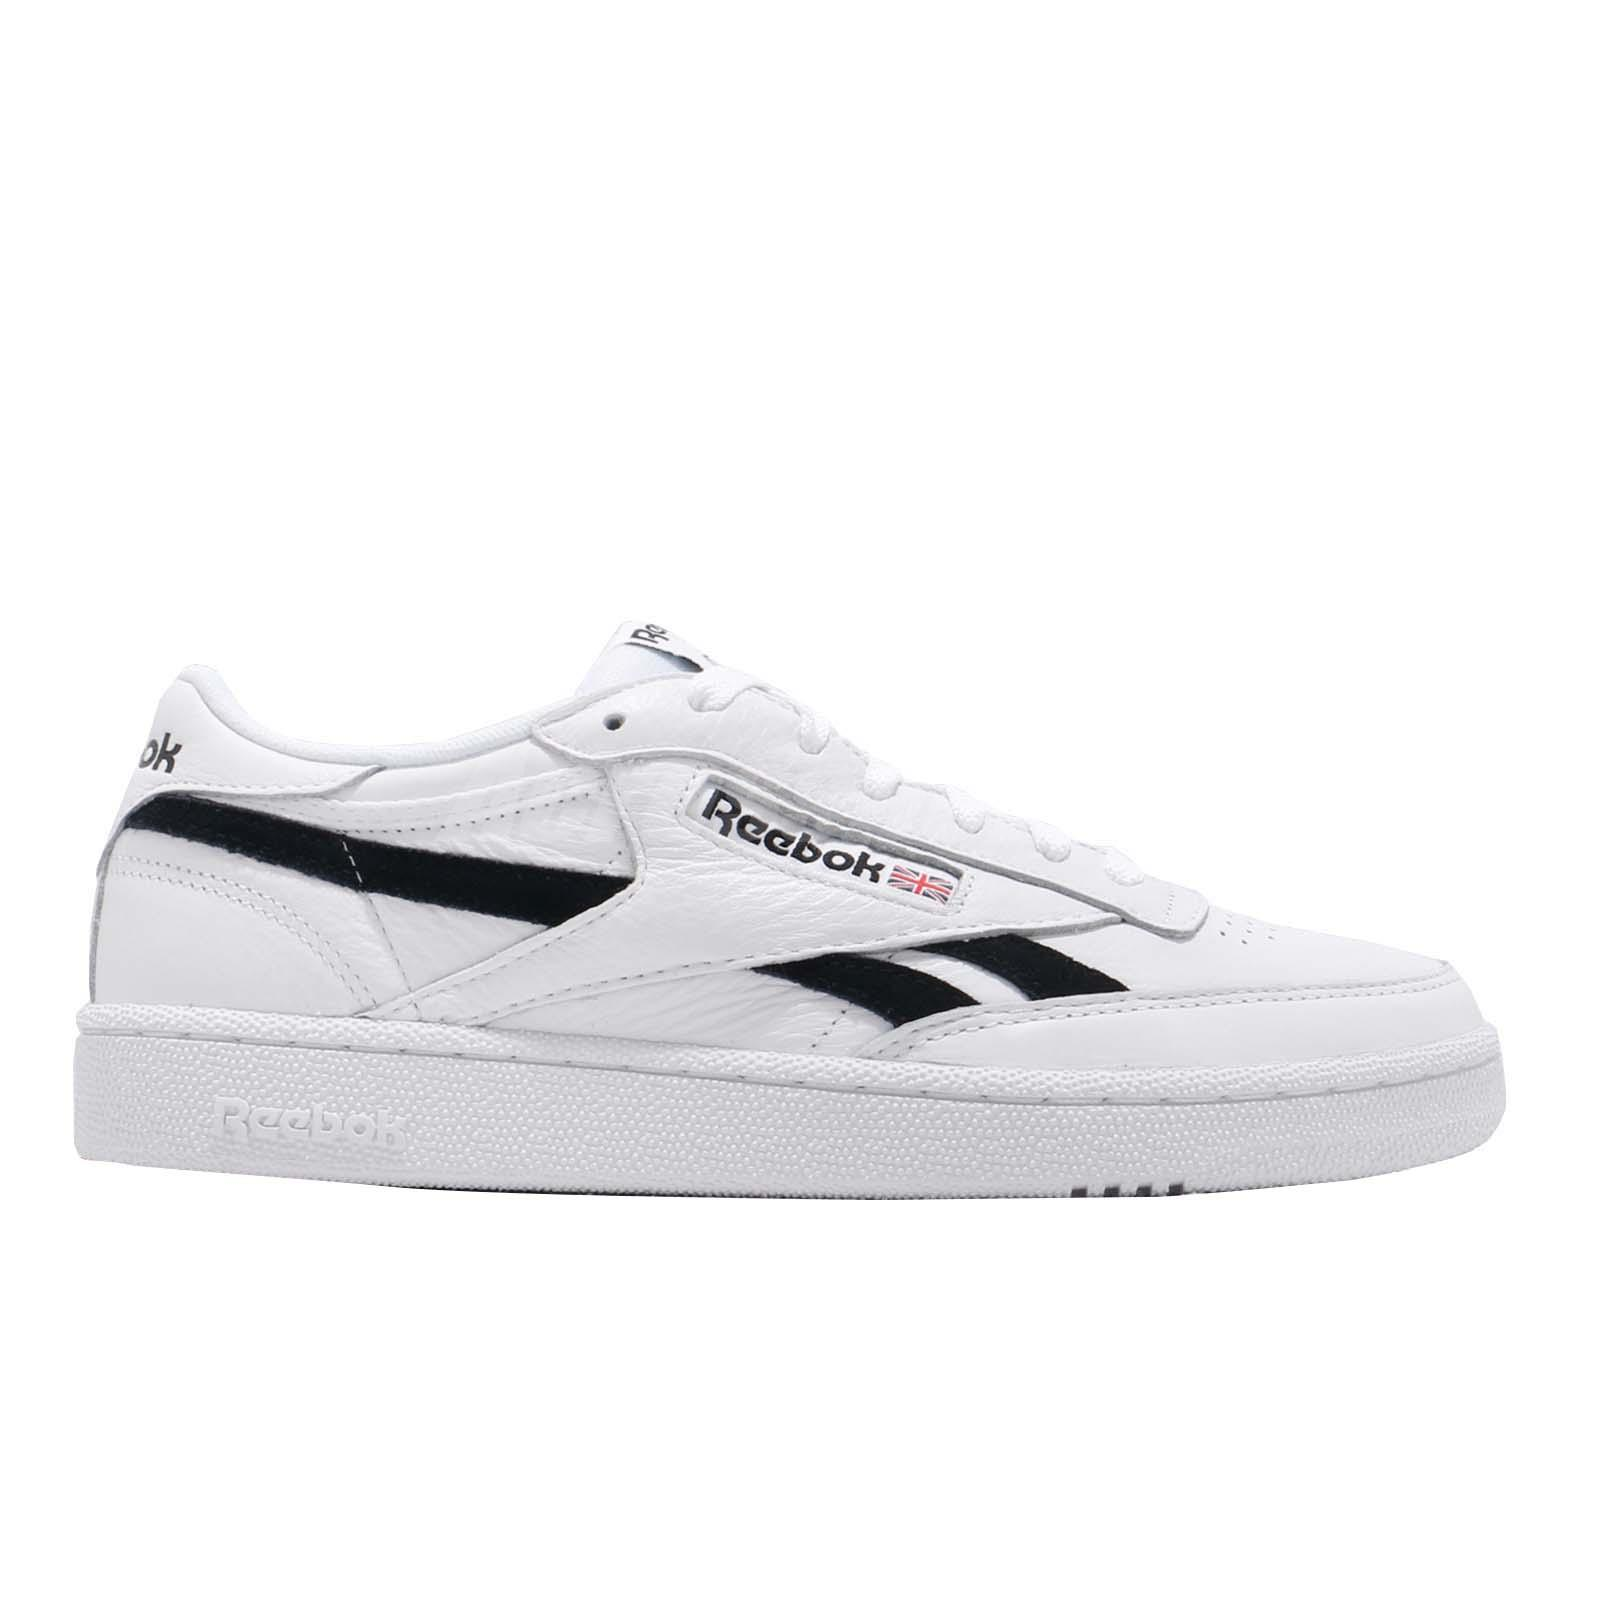 Dettagli su Reebok Revenge Plus MU White Black Men Classic Casual Shoes Sneakers DV4065